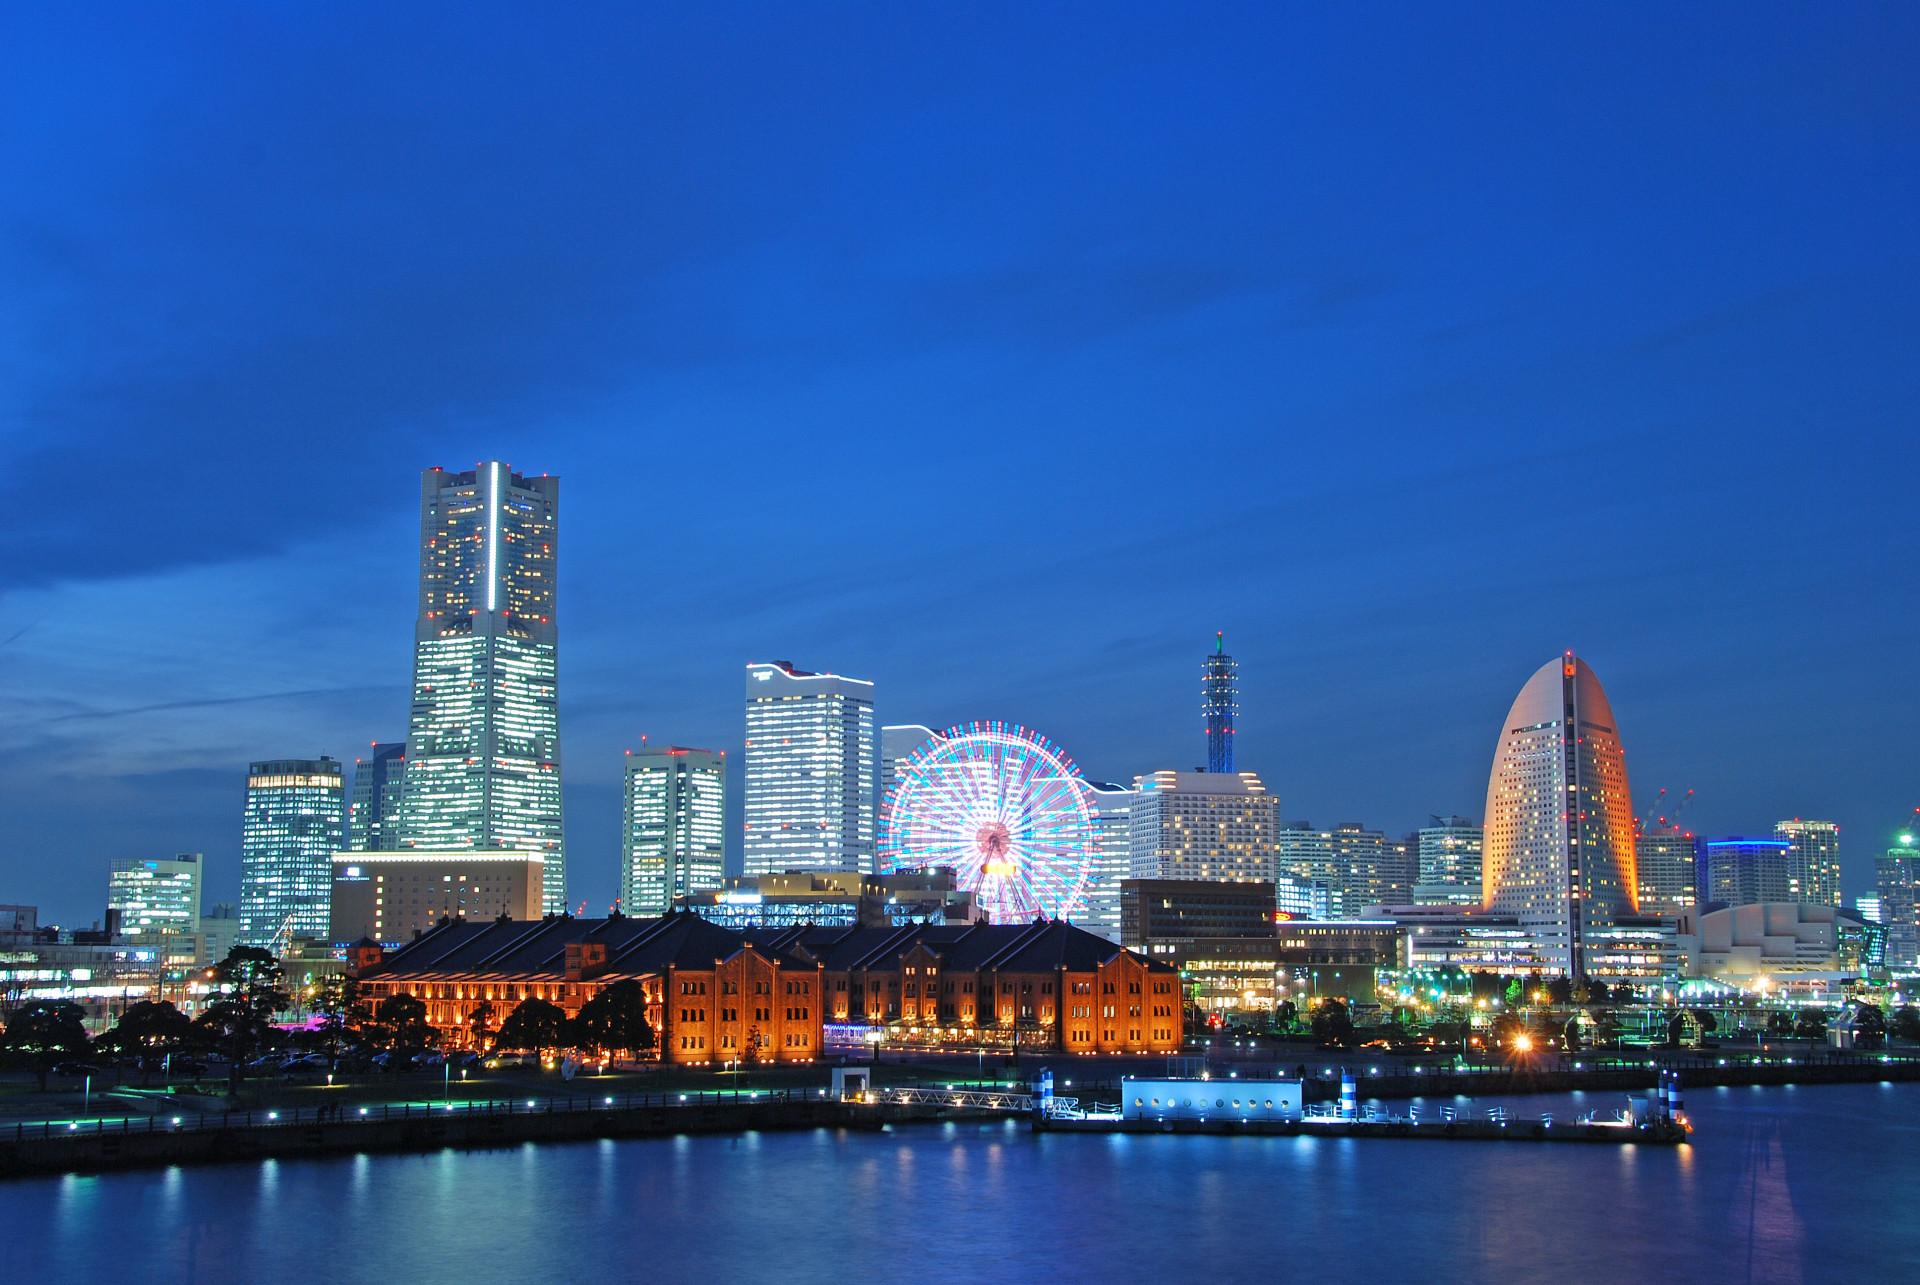 Japan Blockchain Conference - 2019 Yokohama